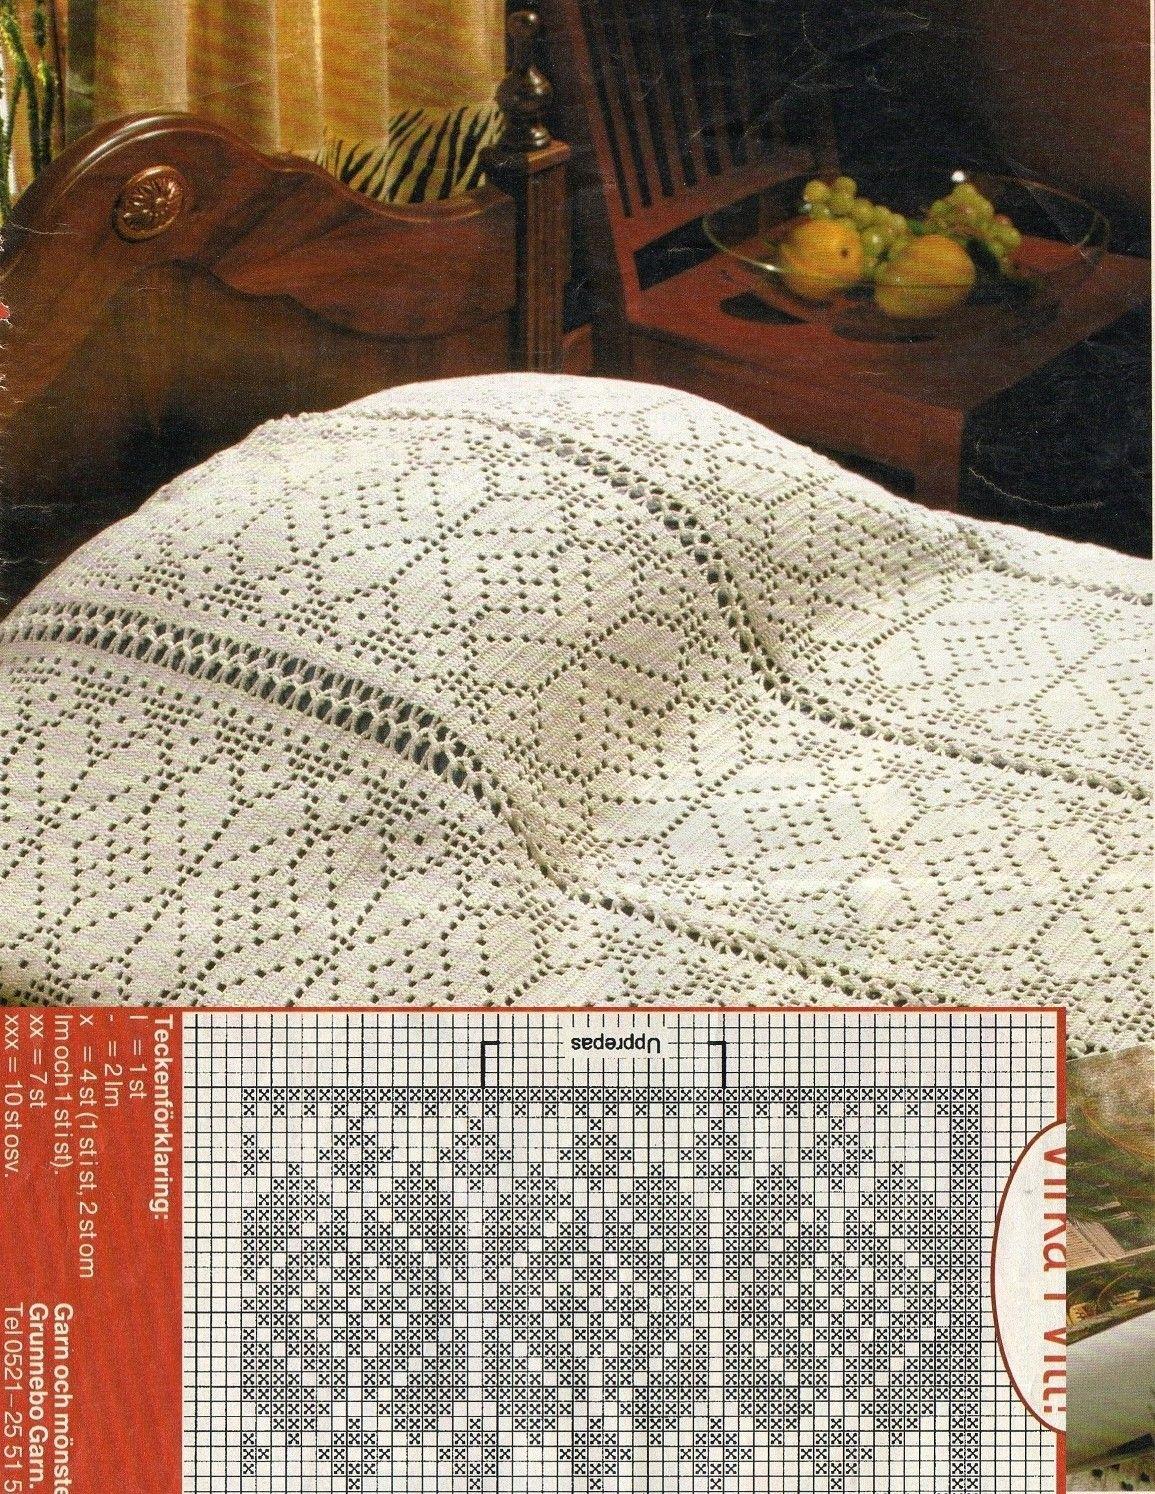 Crochet filet bedspread with diagram crochet filet pinterest crochet filet bedspread with diagram ccuart Gallery